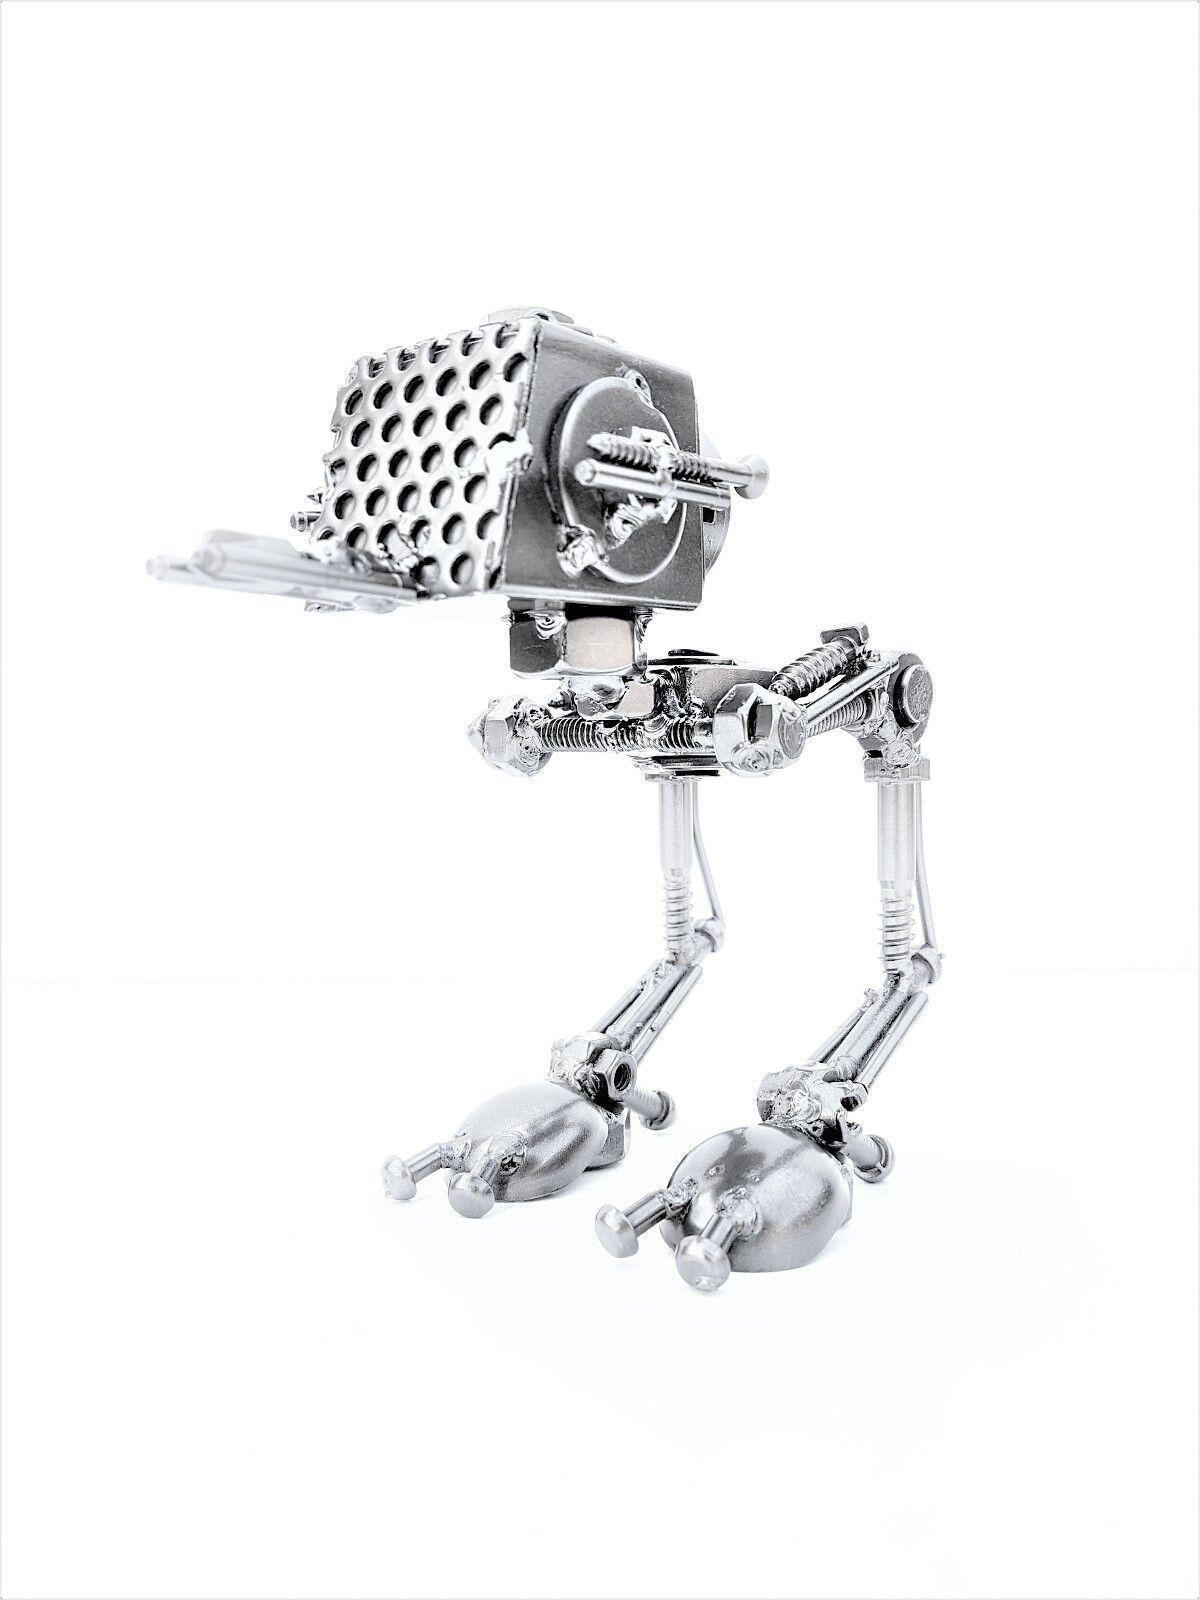 AT ST Star Wars Figure   Model Metal Art Productions Sculpture